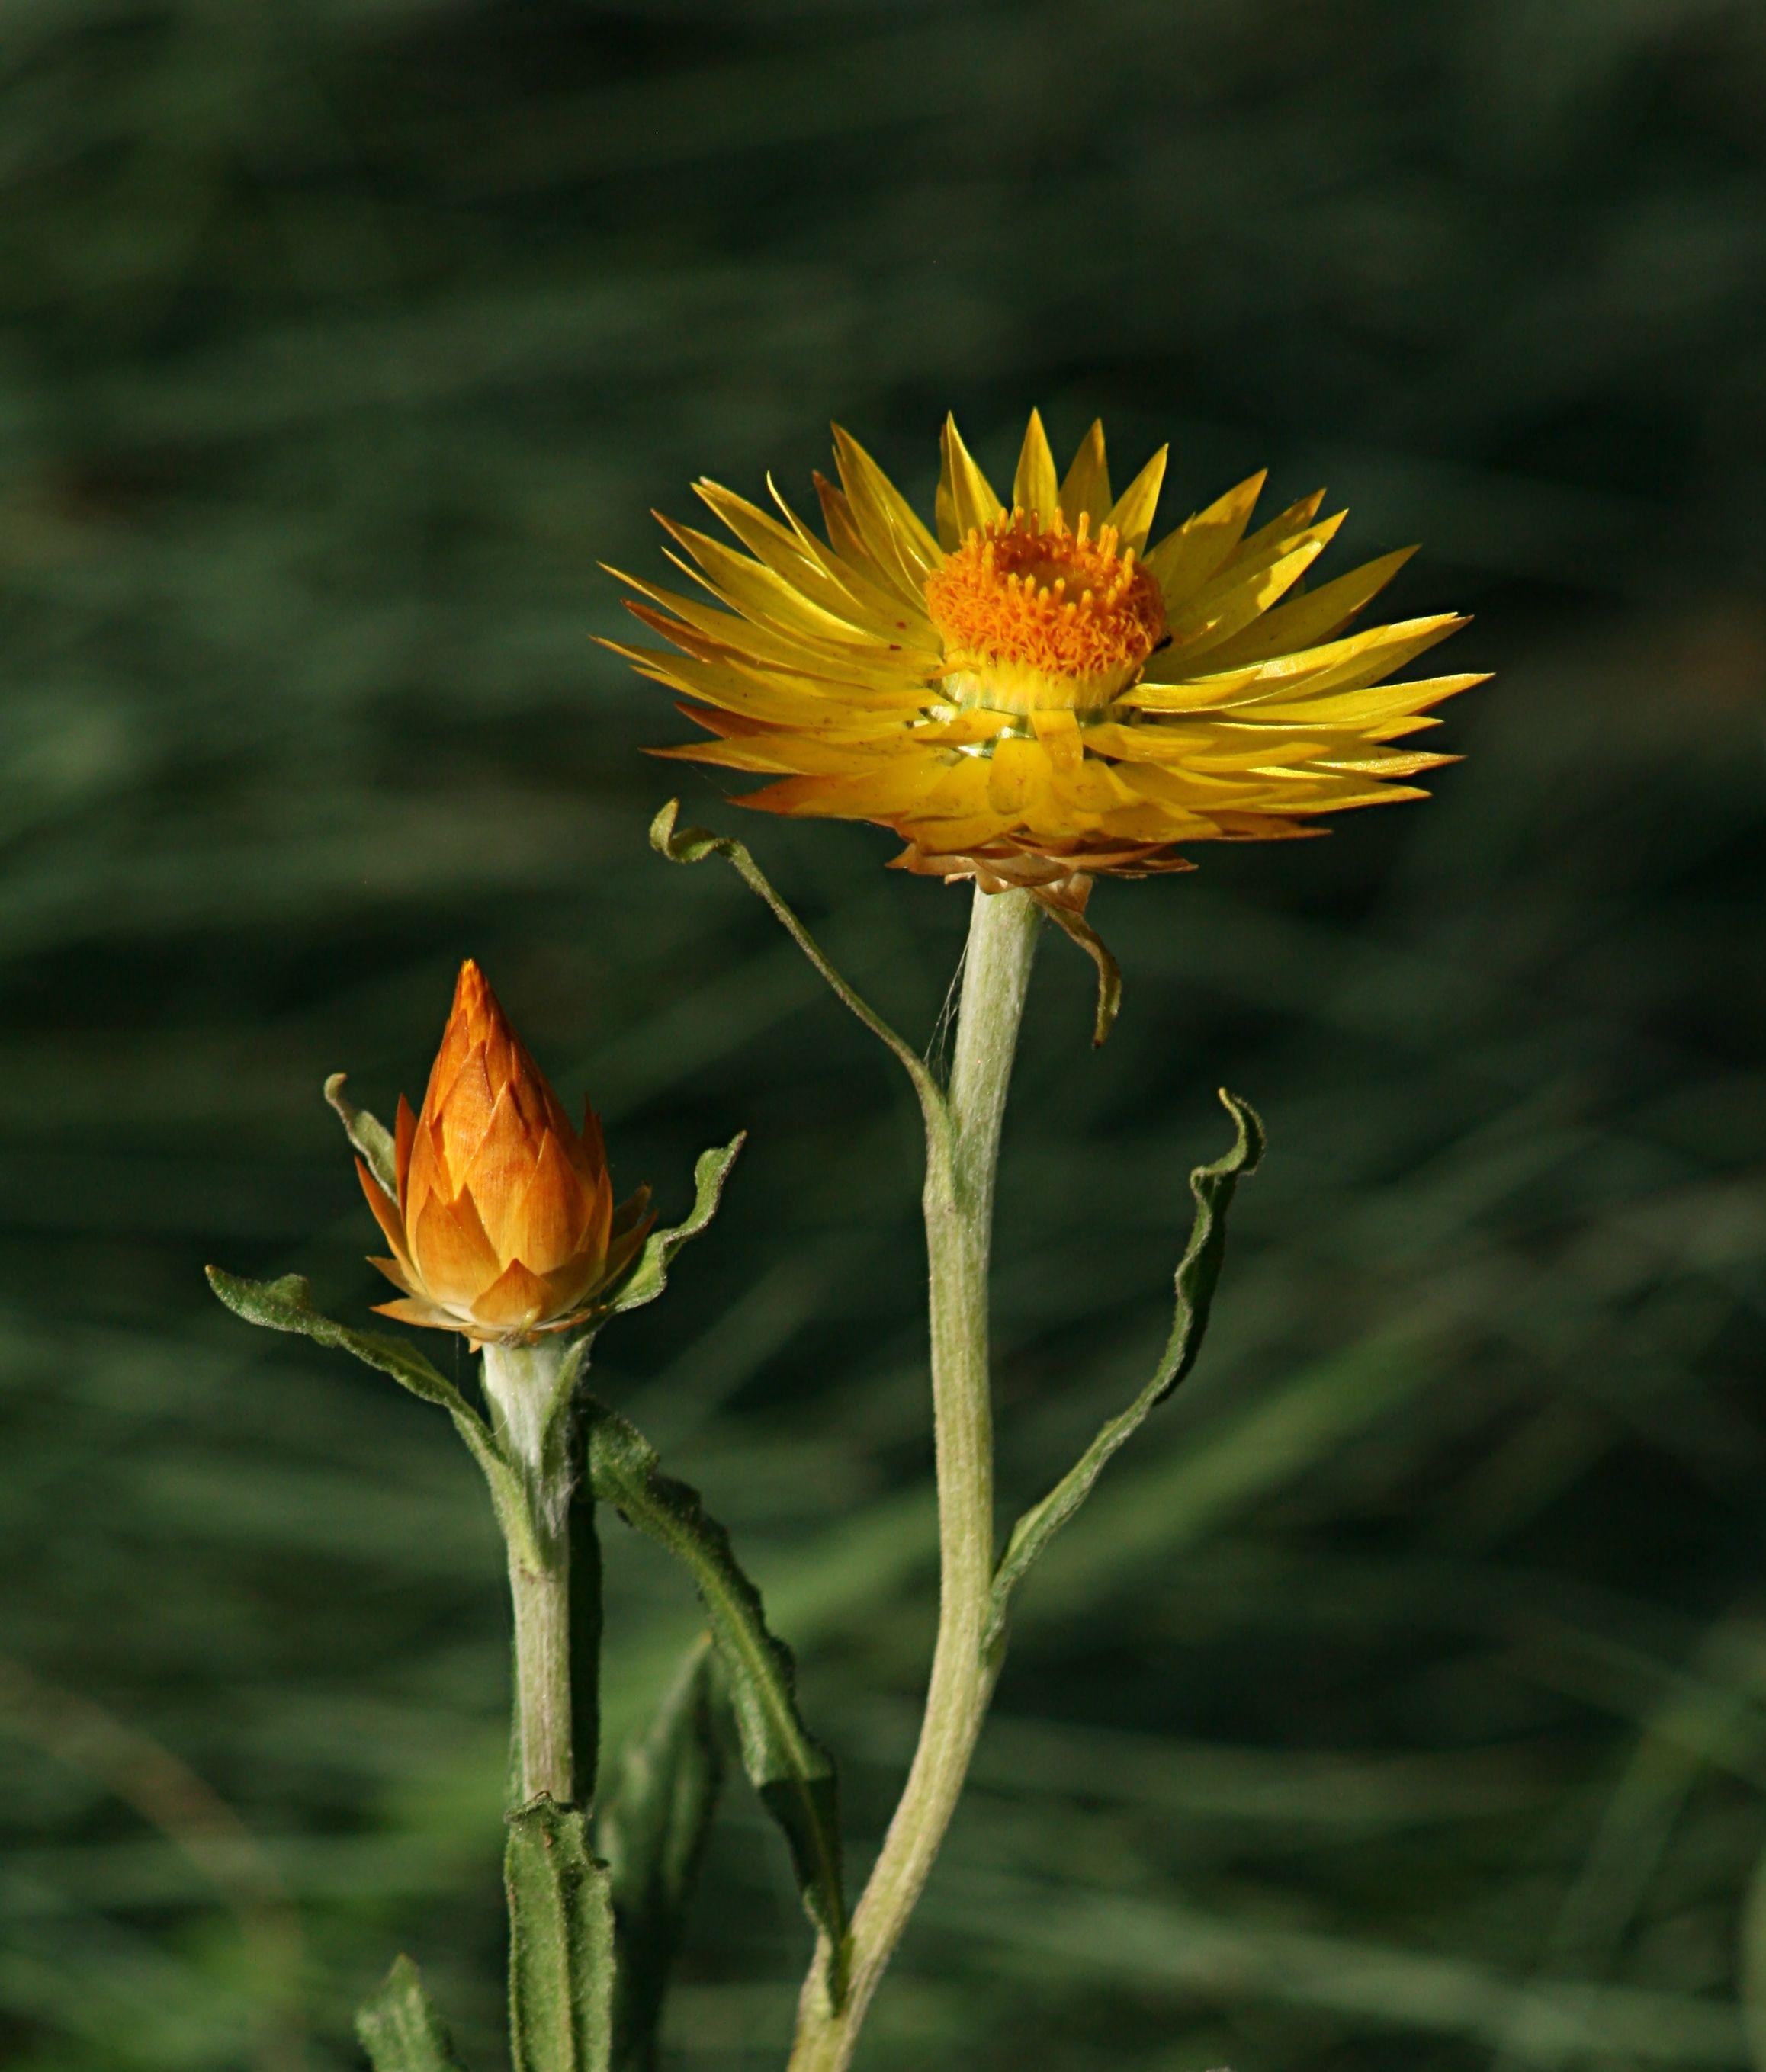 Xerochrysum subundulatum [Synonyms Bracteantha